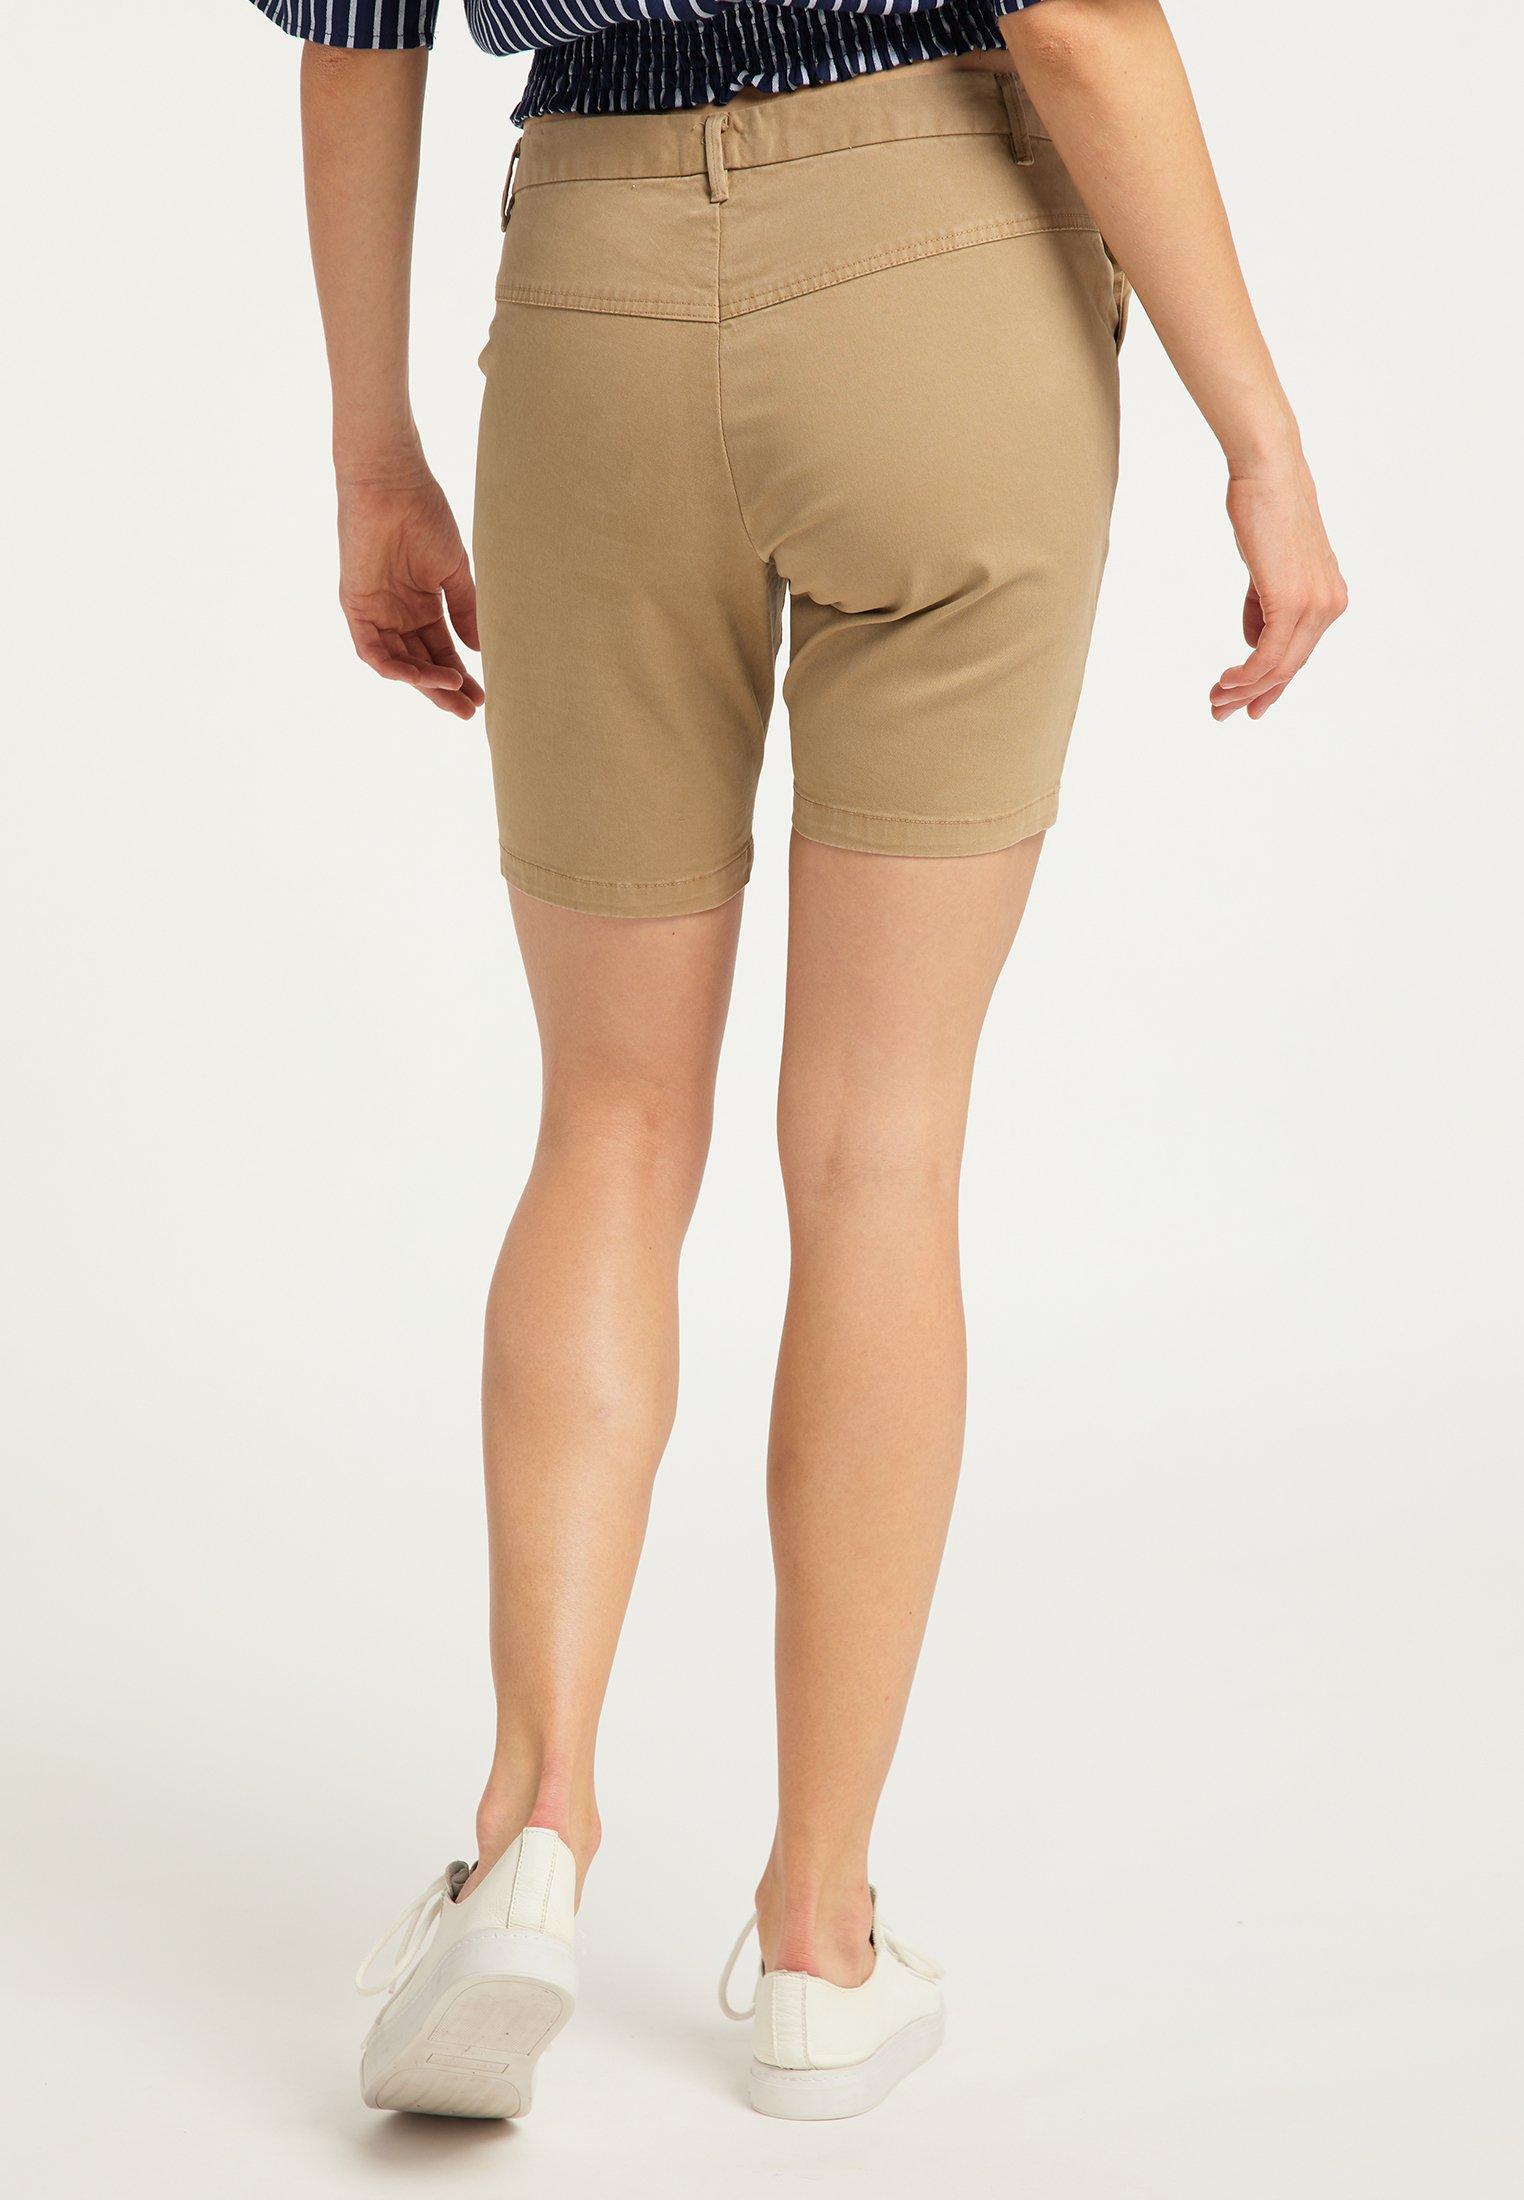 Official Site Women's Clothing DreiMaster Shorts beige Jn3Ae0EfV